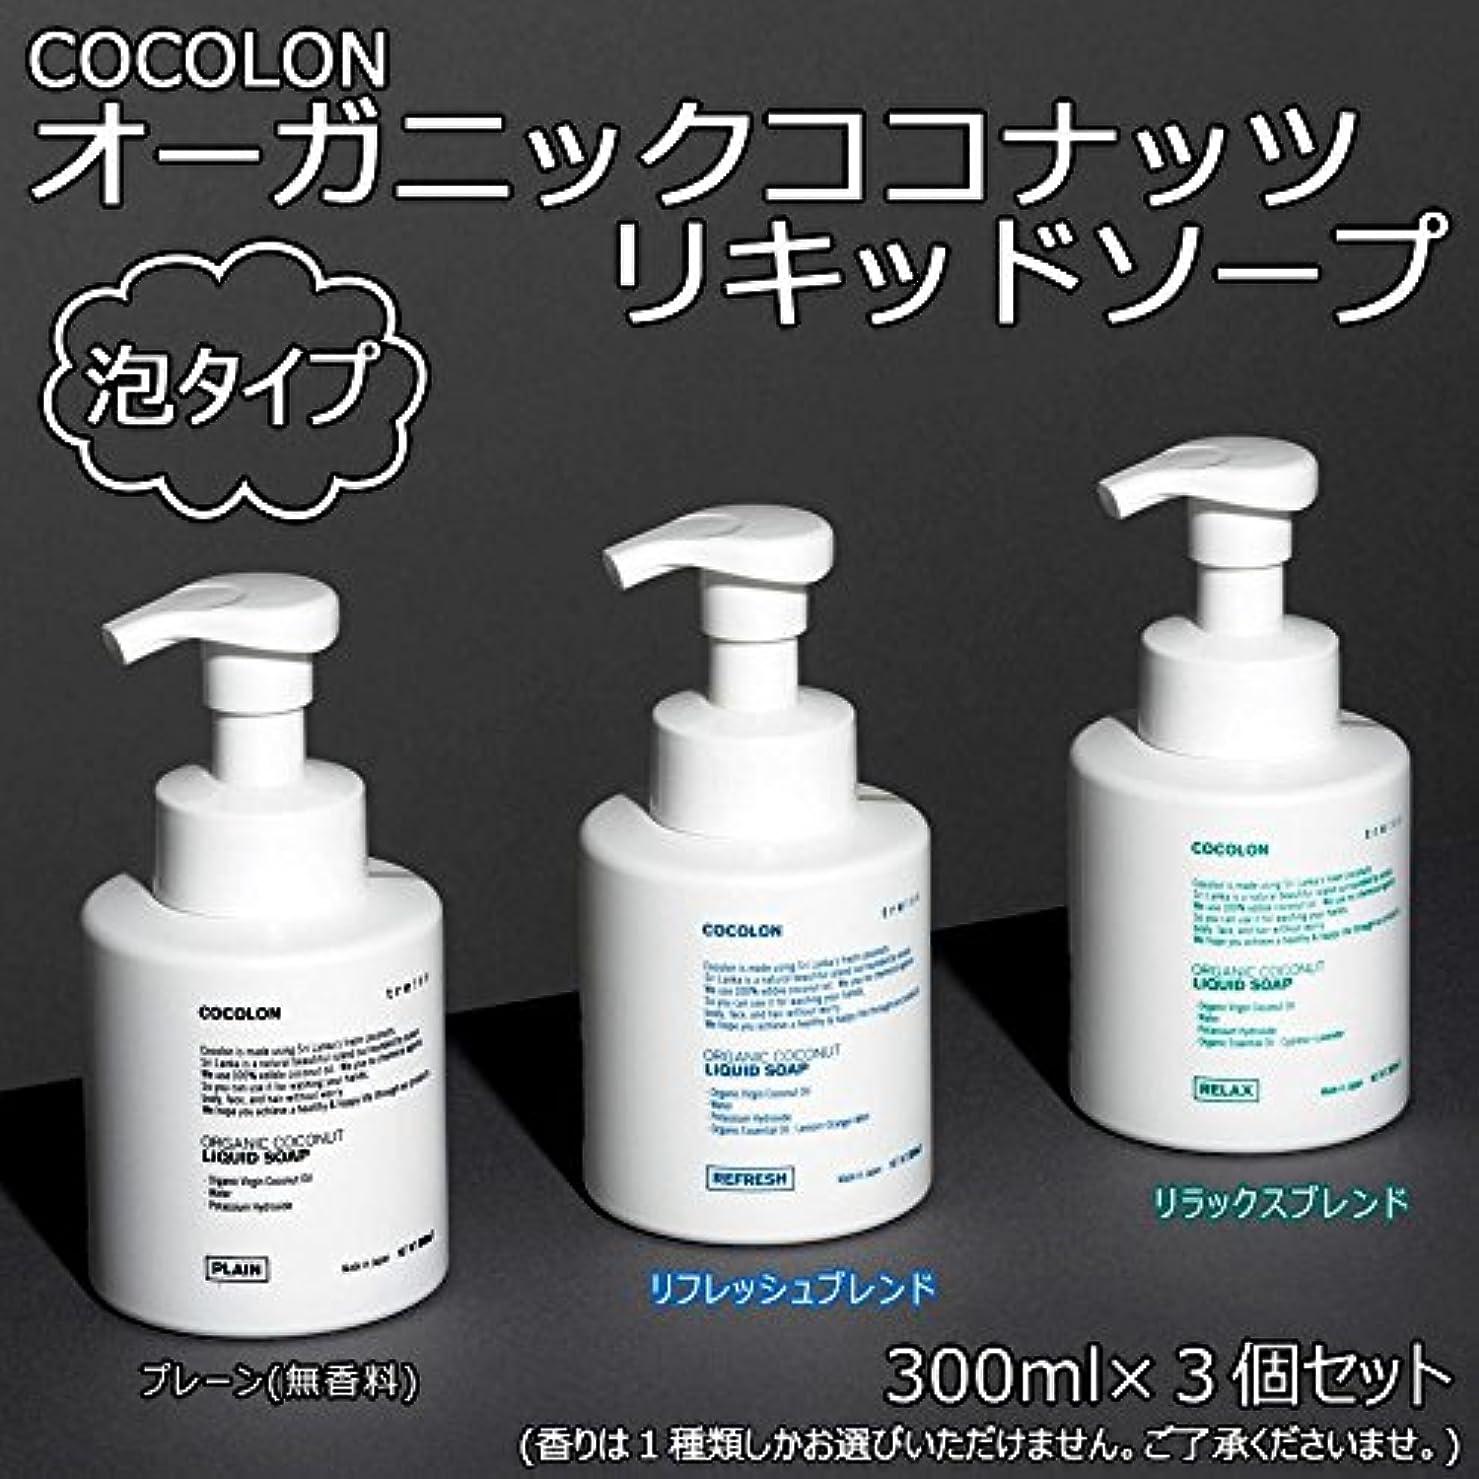 COCOLON ココロン オーガニックココナッツリキッドソープ 泡タイプ 300ml 3個セット【同梱?代引不可】 ■3種類の内「リラックスブレンド」のみです